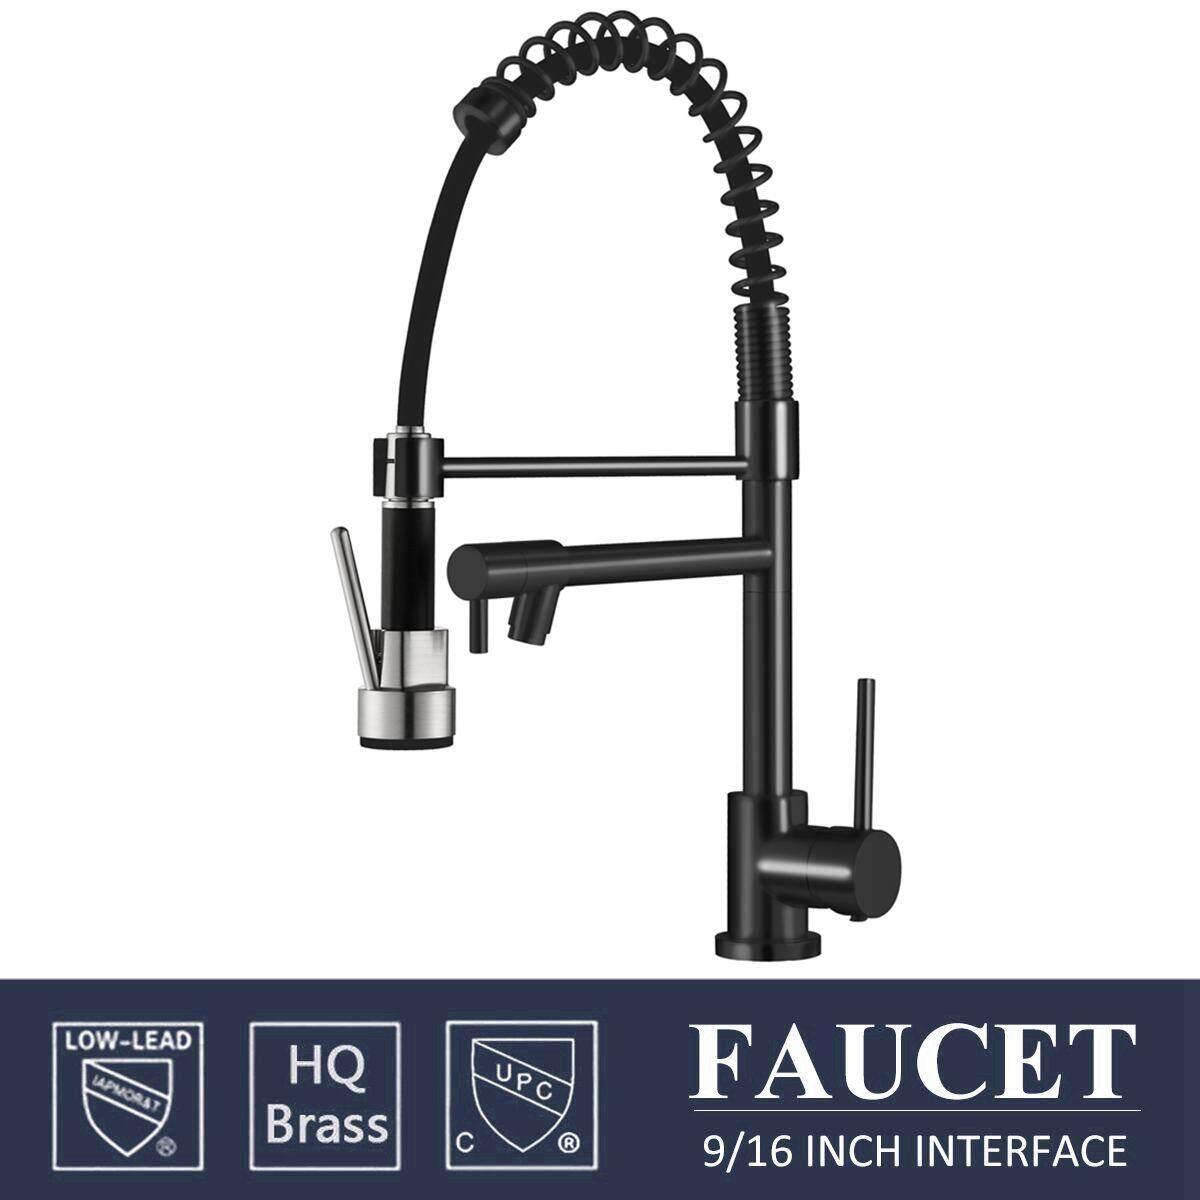 Holmark Chrome+black Brass Kitchen Faucet Pull Down Spray Swivel Sink Mixer Tap 1/2 Uk Plug Black - Intl By Audew.